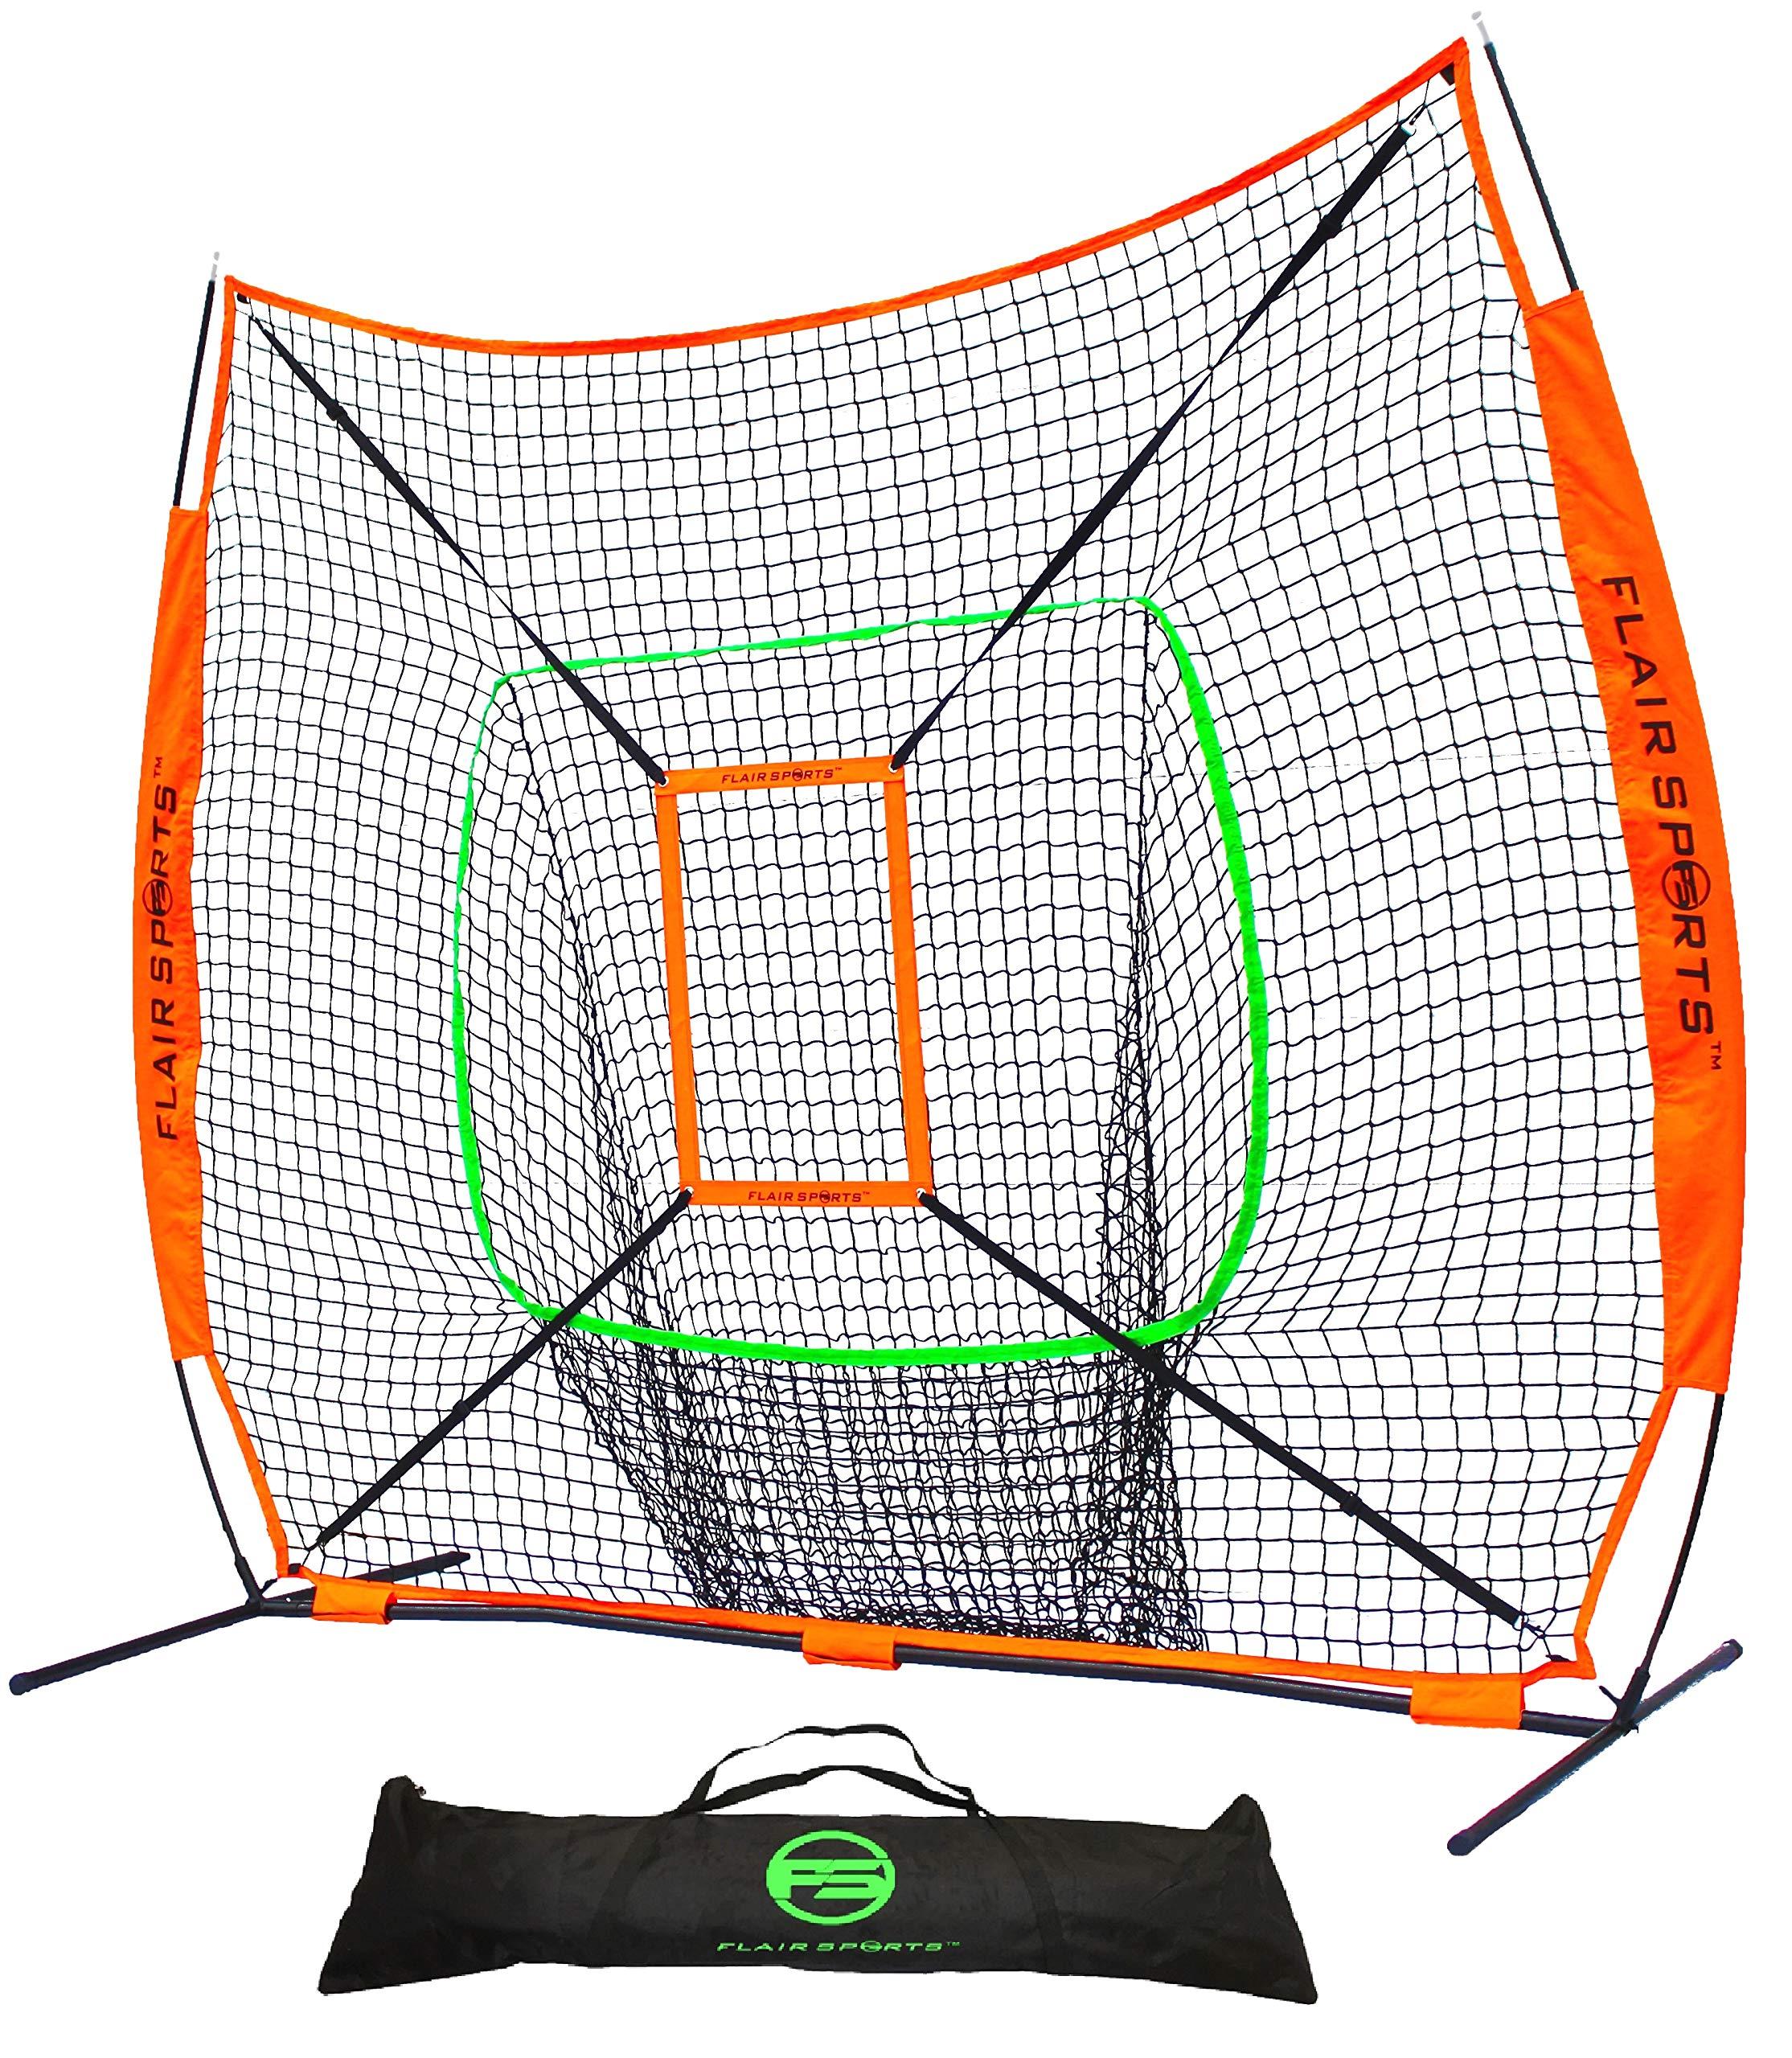 Flair Sports Baseball & Softball Net for Hitting & Pitching | Heavy Duty 7x7 Pro Series | Indoor & Outdoor Training Net | Bow Frame + Bonus Strike Zone Included (Neon Orange, Neon Green)